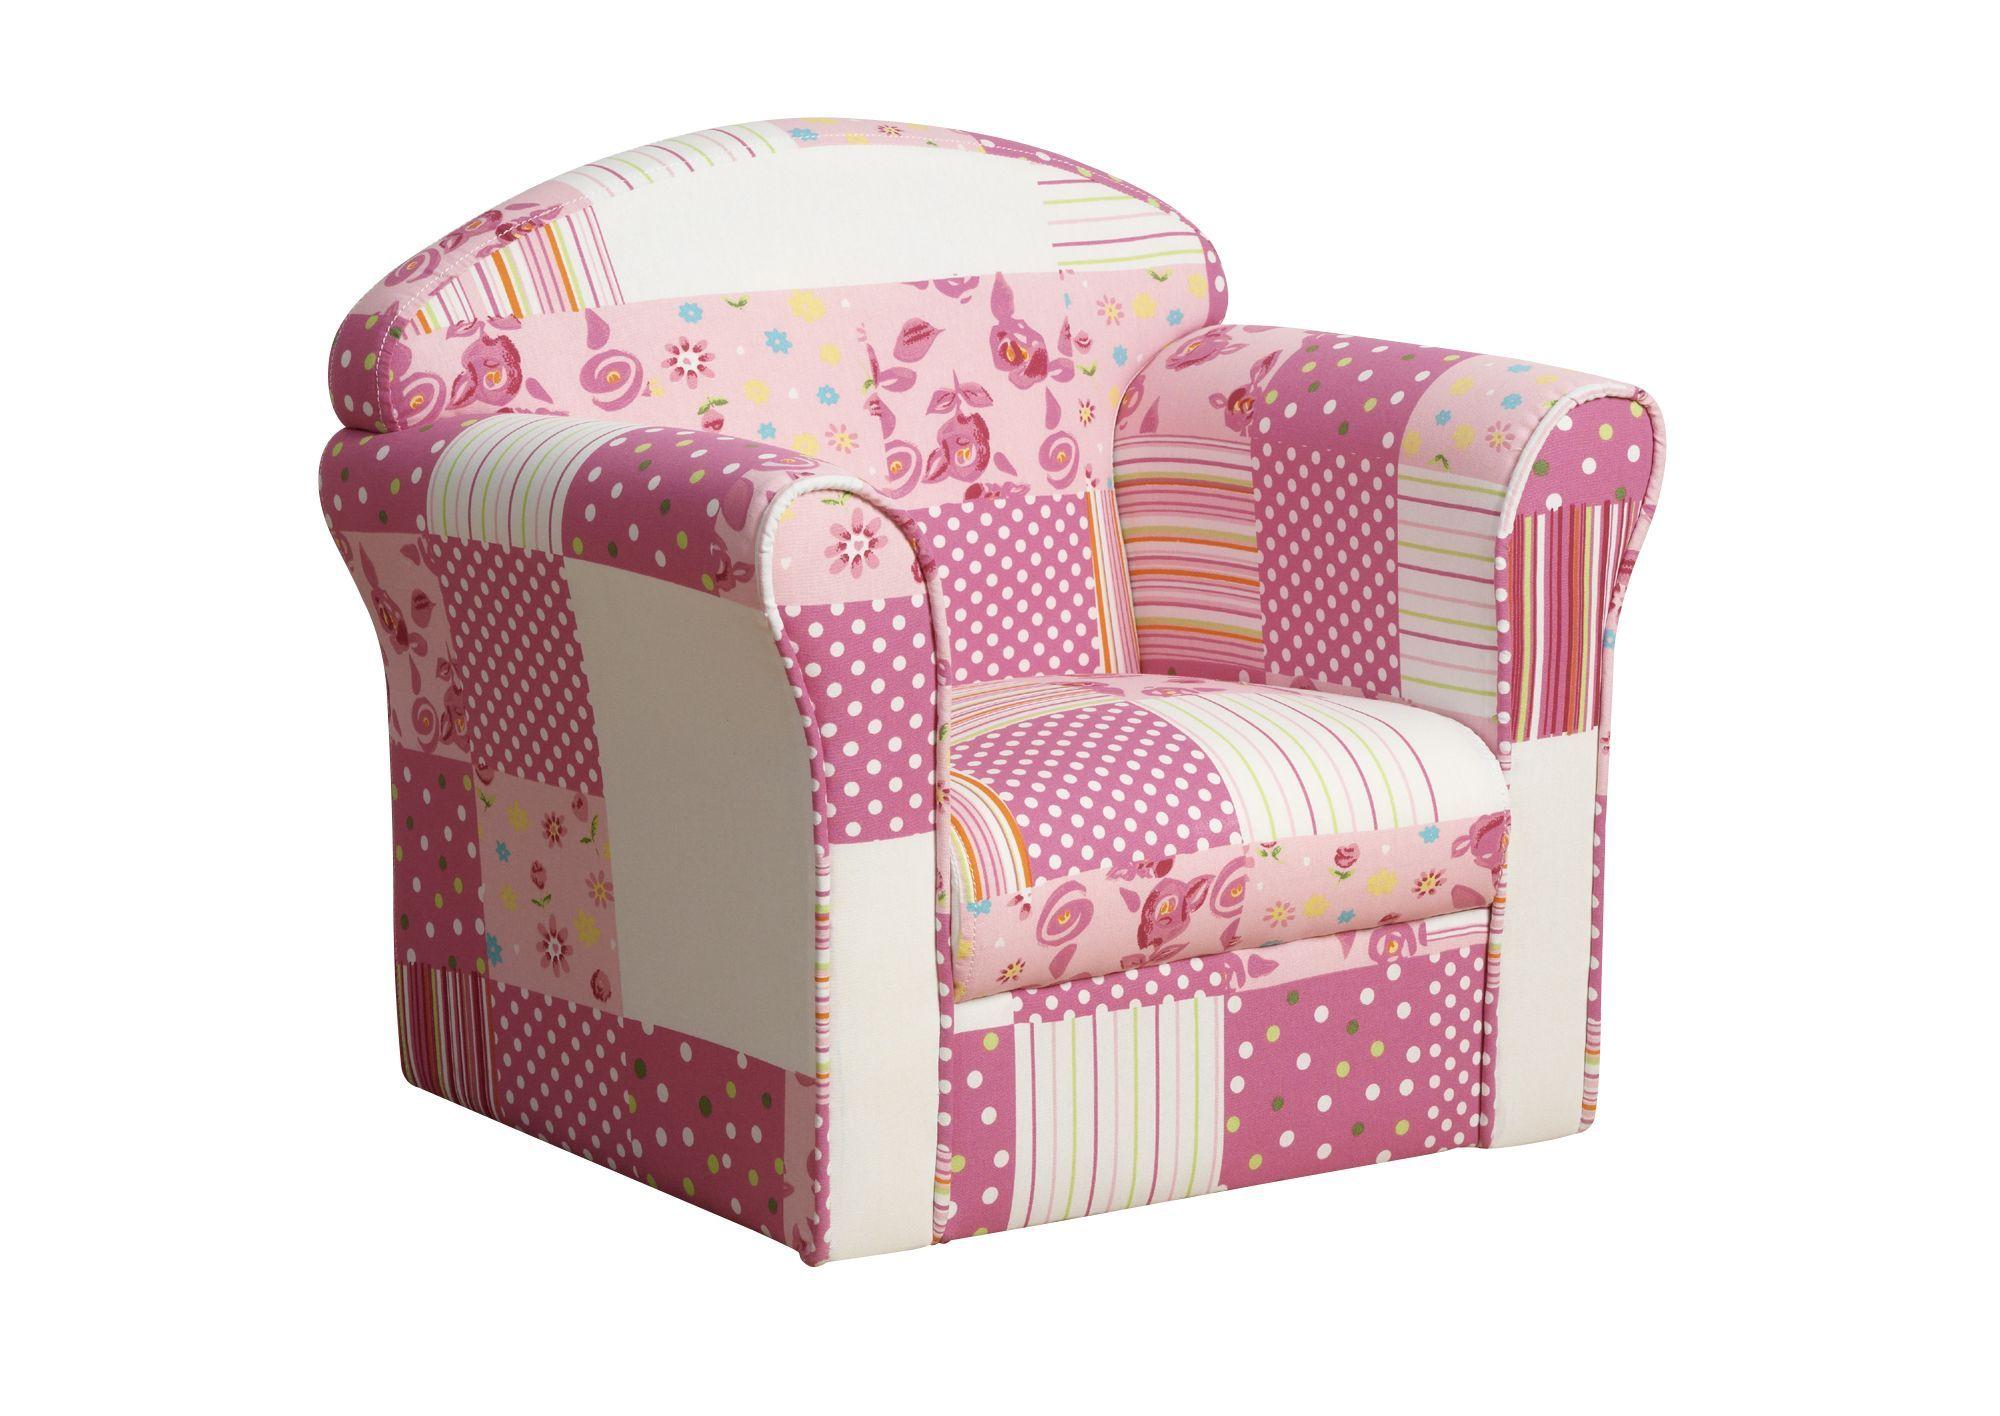 Kidsaw Mini Armchair Pink Patchwork Theodora S Room